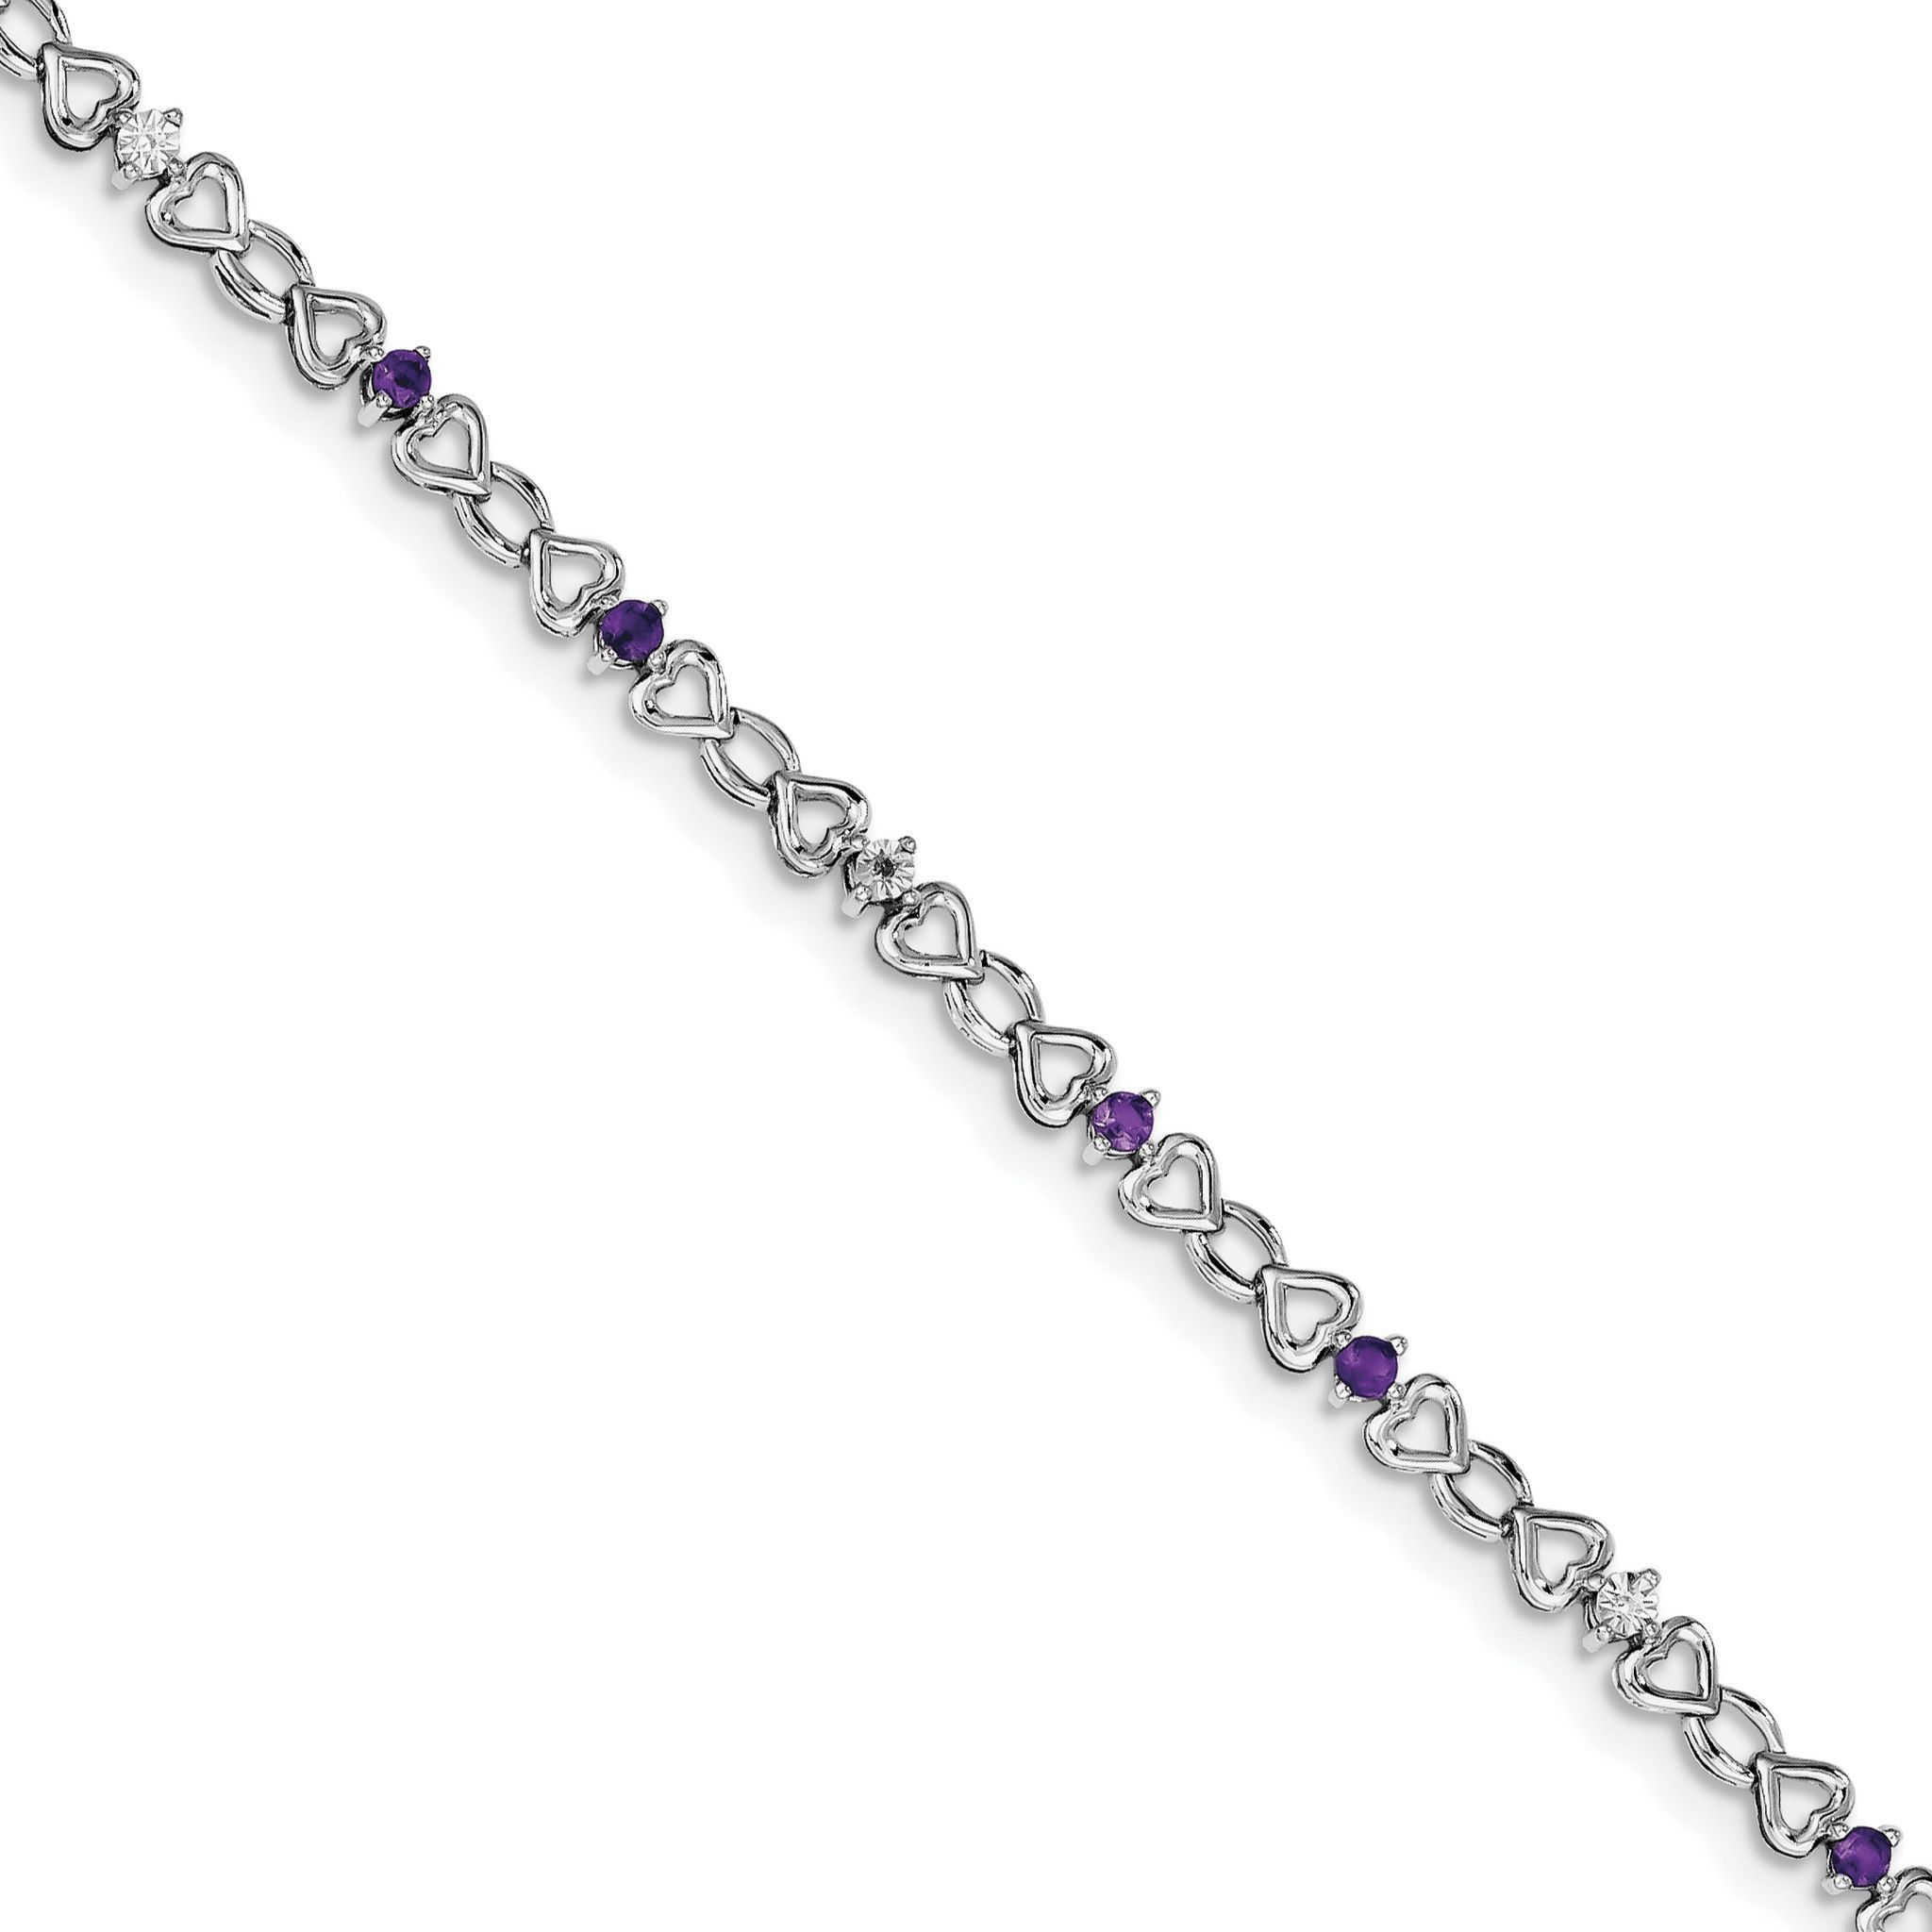 Sterling Silver Rhodium-plated Amethyst & Diamond Bracelet QX849AM